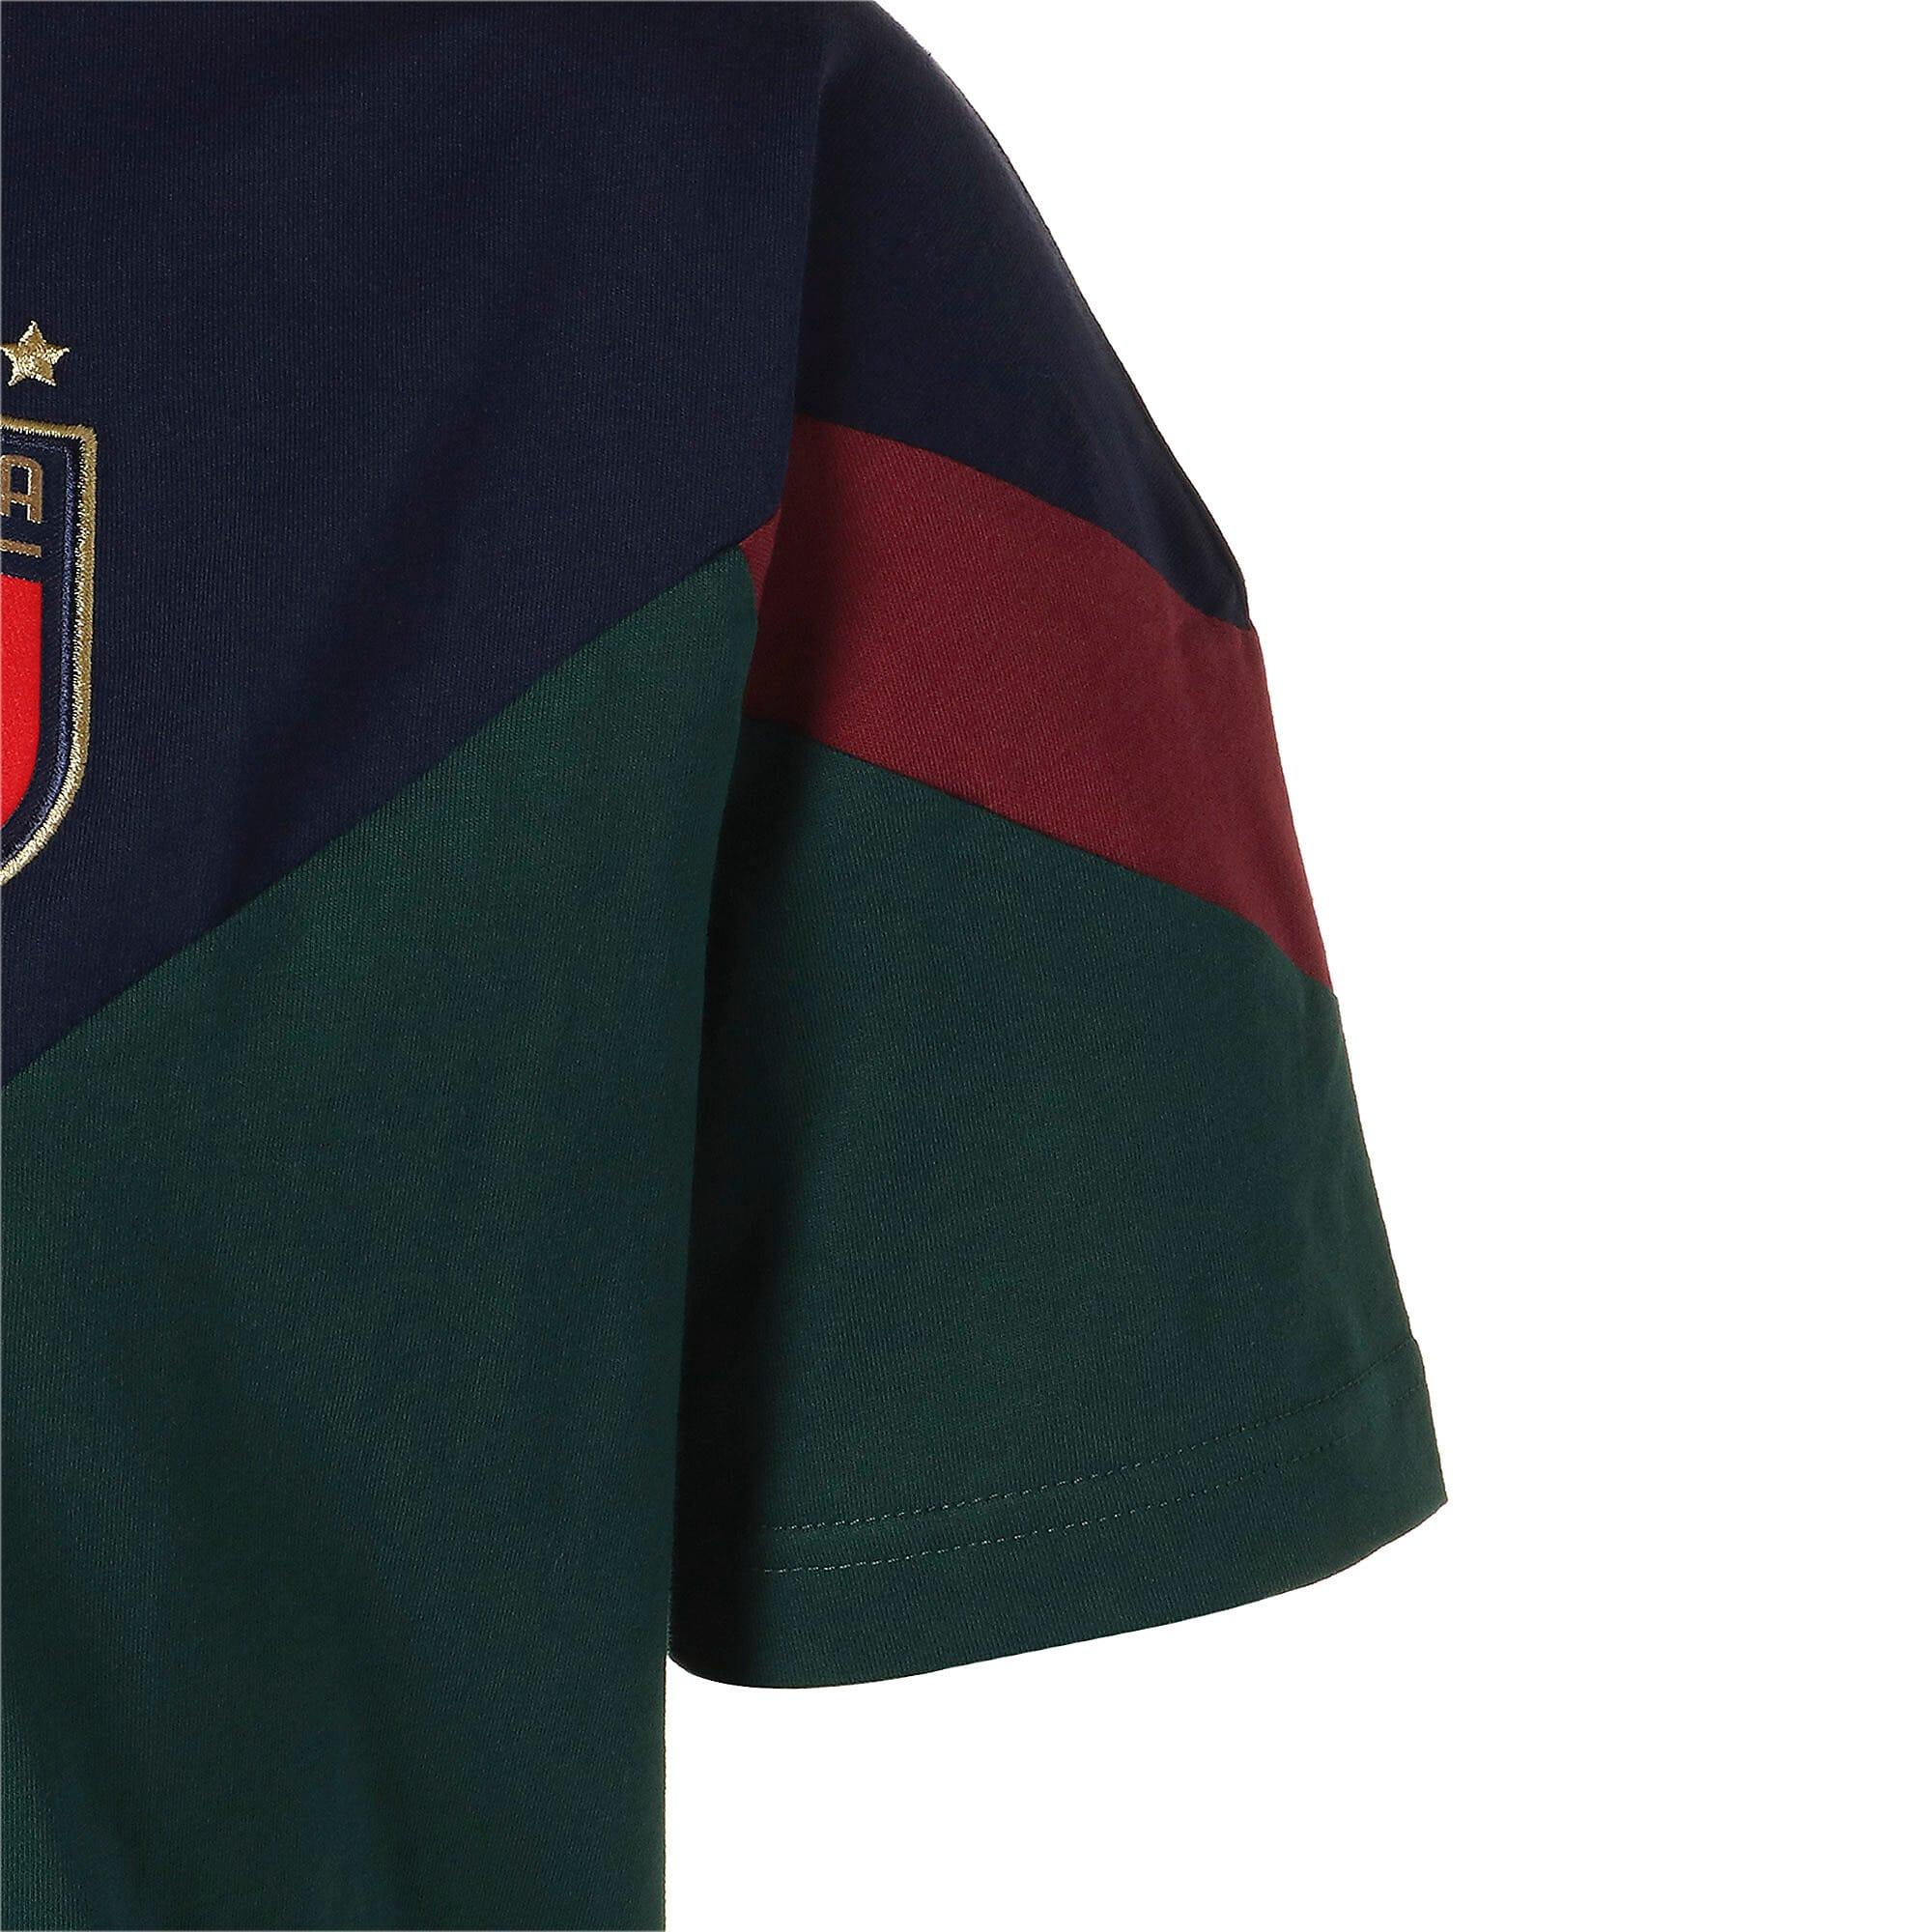 Thumbnail 5 of FIGC イタリア ICONIC MCS Tシャツ 半袖, Ponderosa Pine-peacoat, medium-JPN